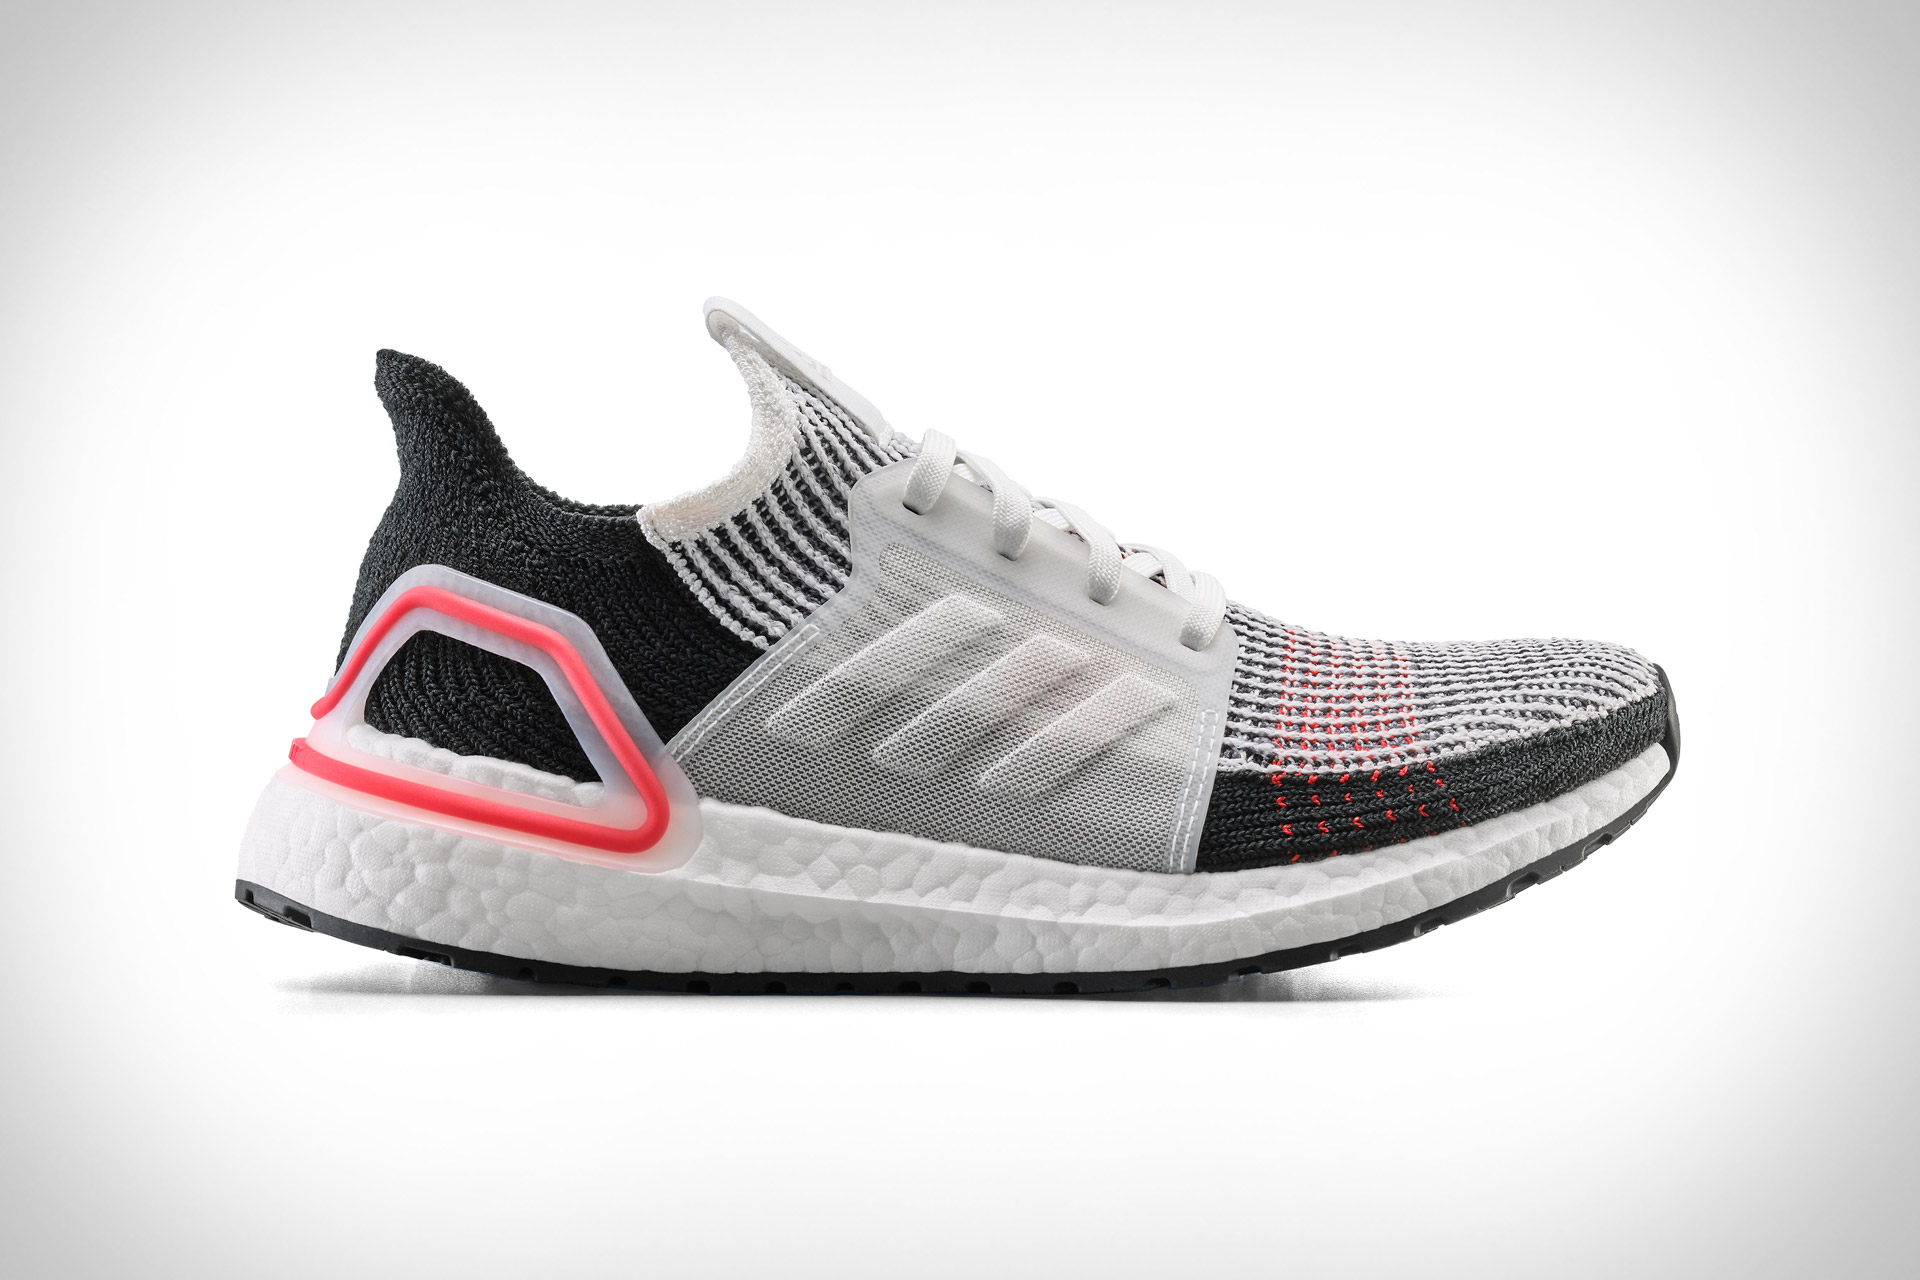 77b648bb4c9 Adidas Ultraboost 19 Sneaker